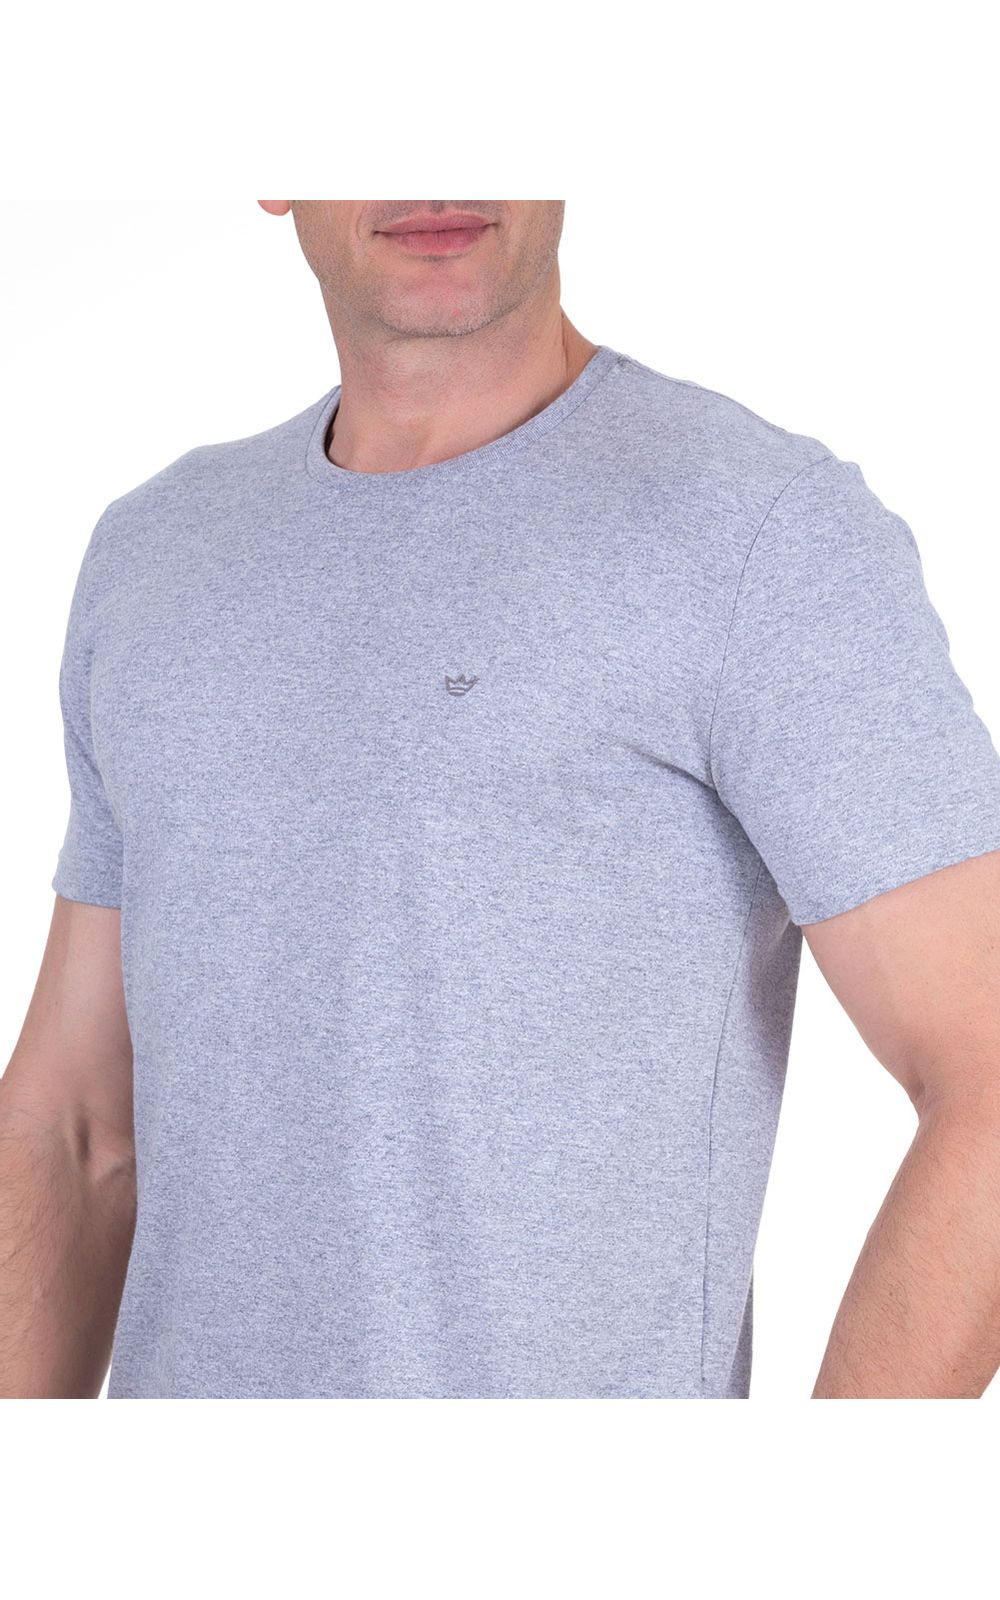 Foto 3 - Camiseta Masculina Cinza Lisa